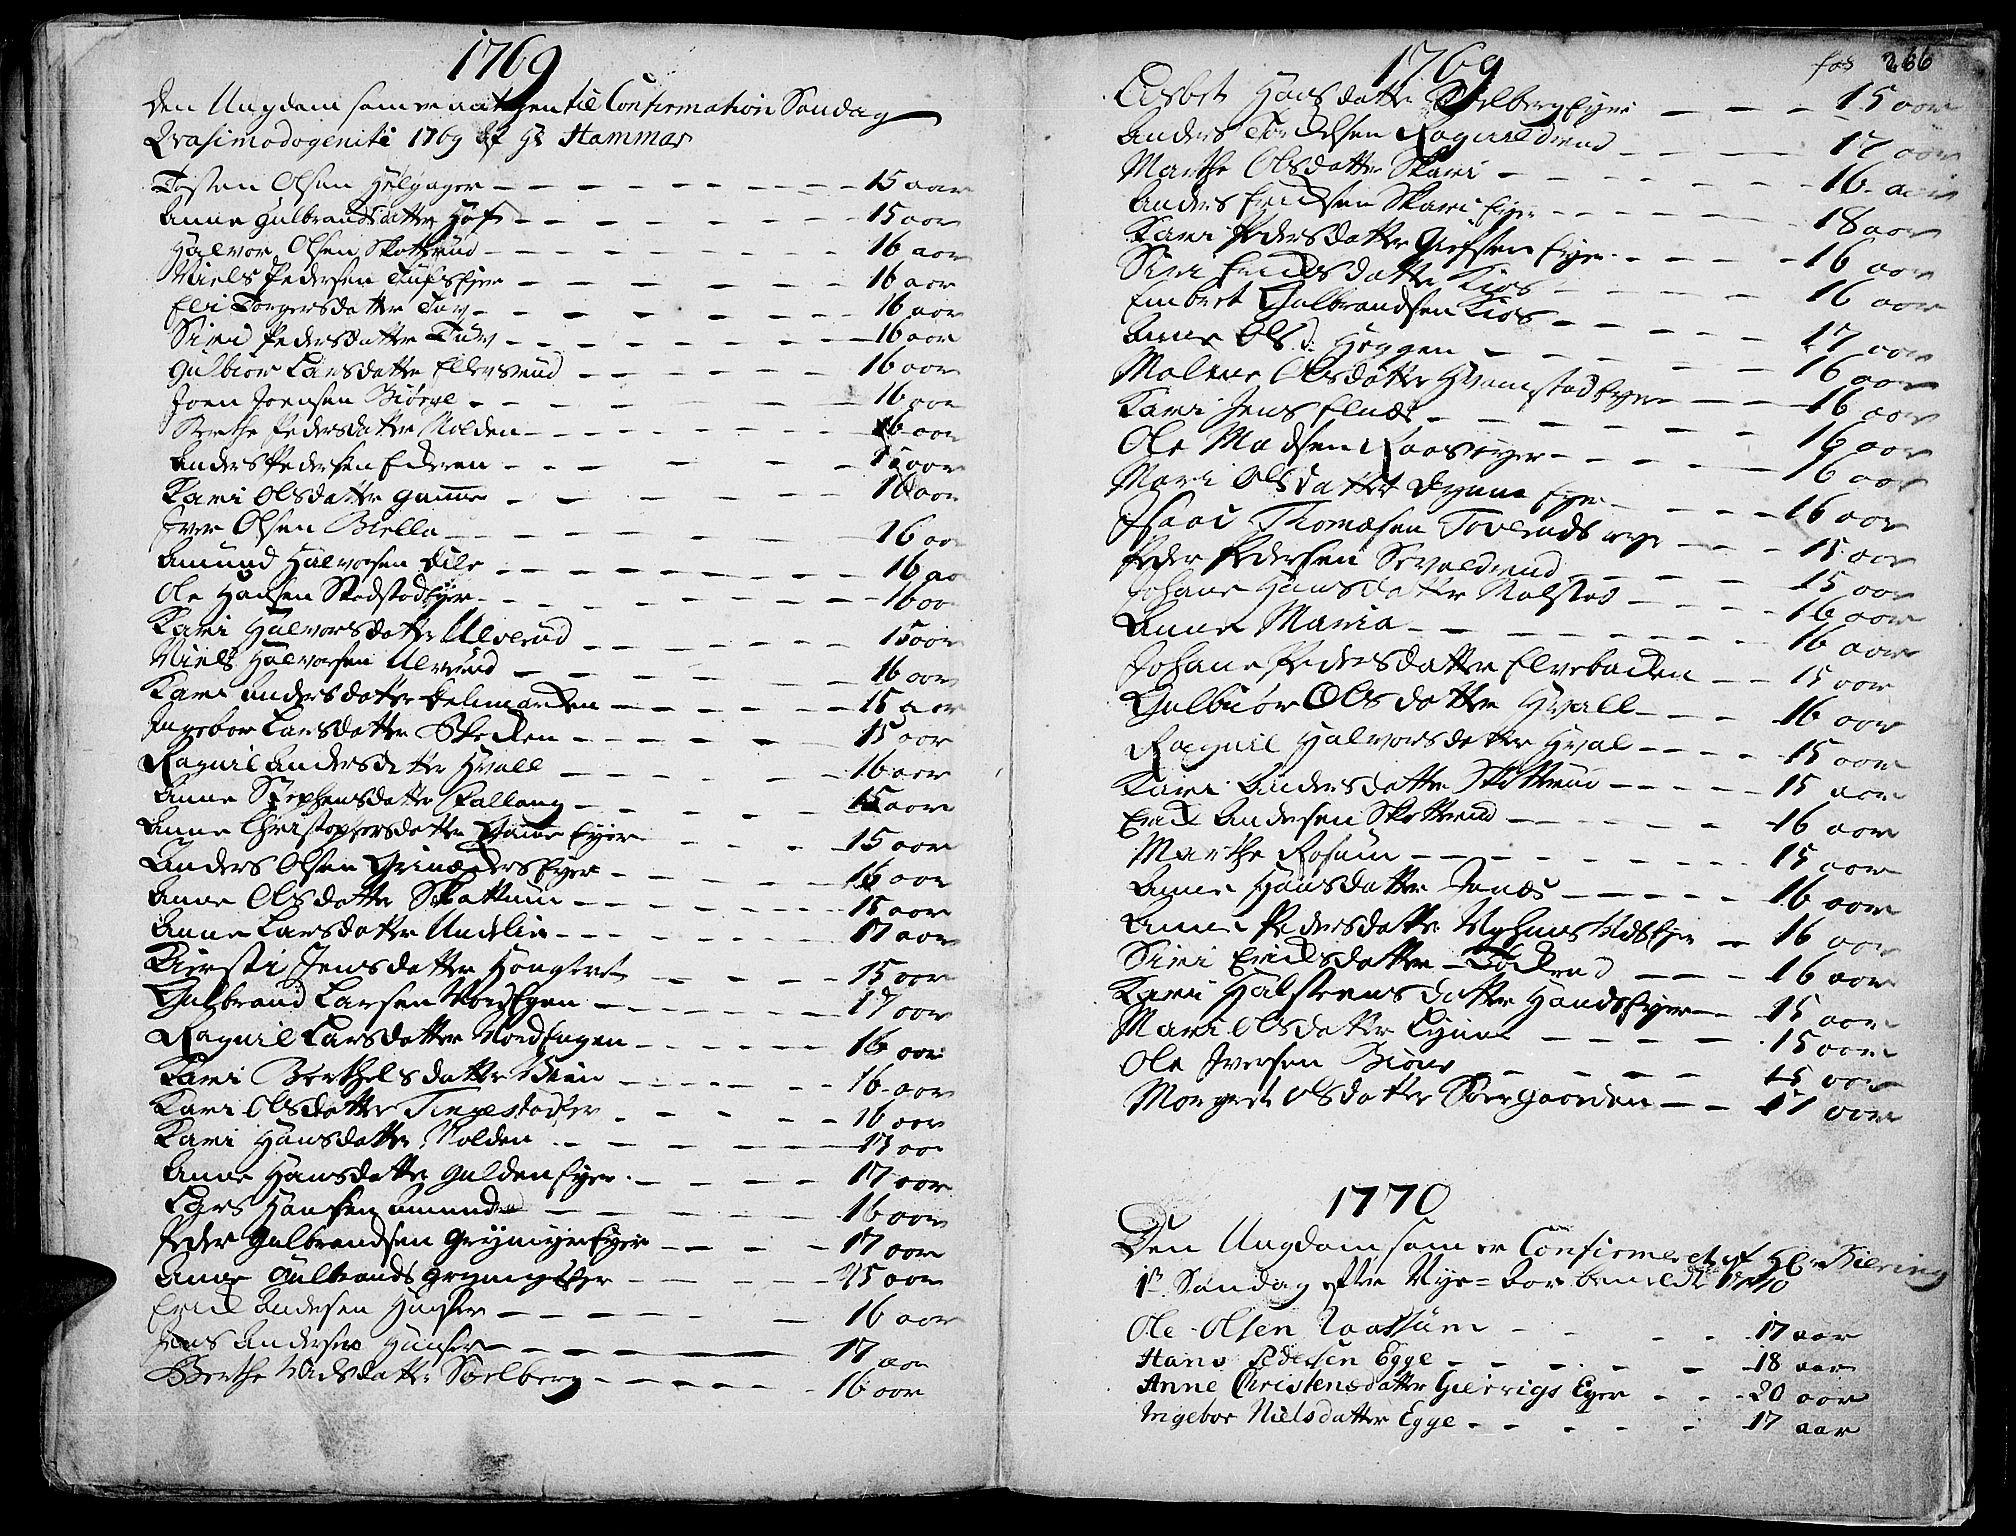 SAH, Gran prestekontor, Ministerialbok nr. 4, 1759-1775, s. 266